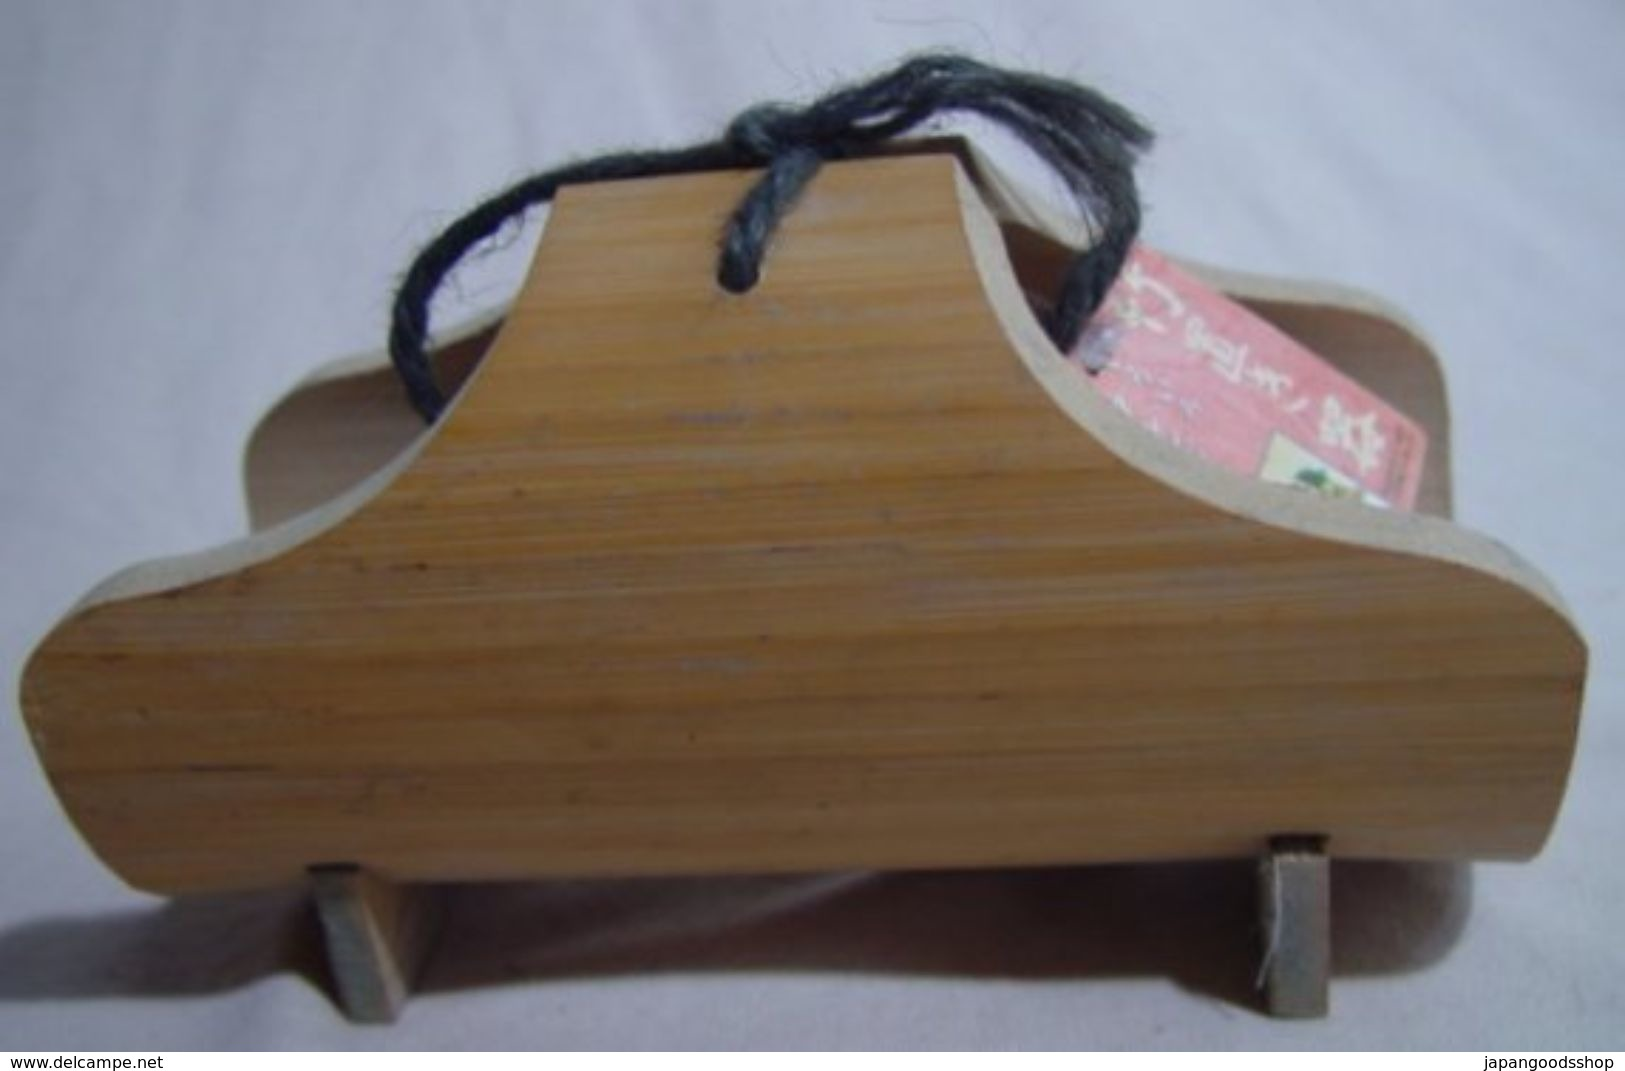 Bamboo For Display - Creative Hobbies